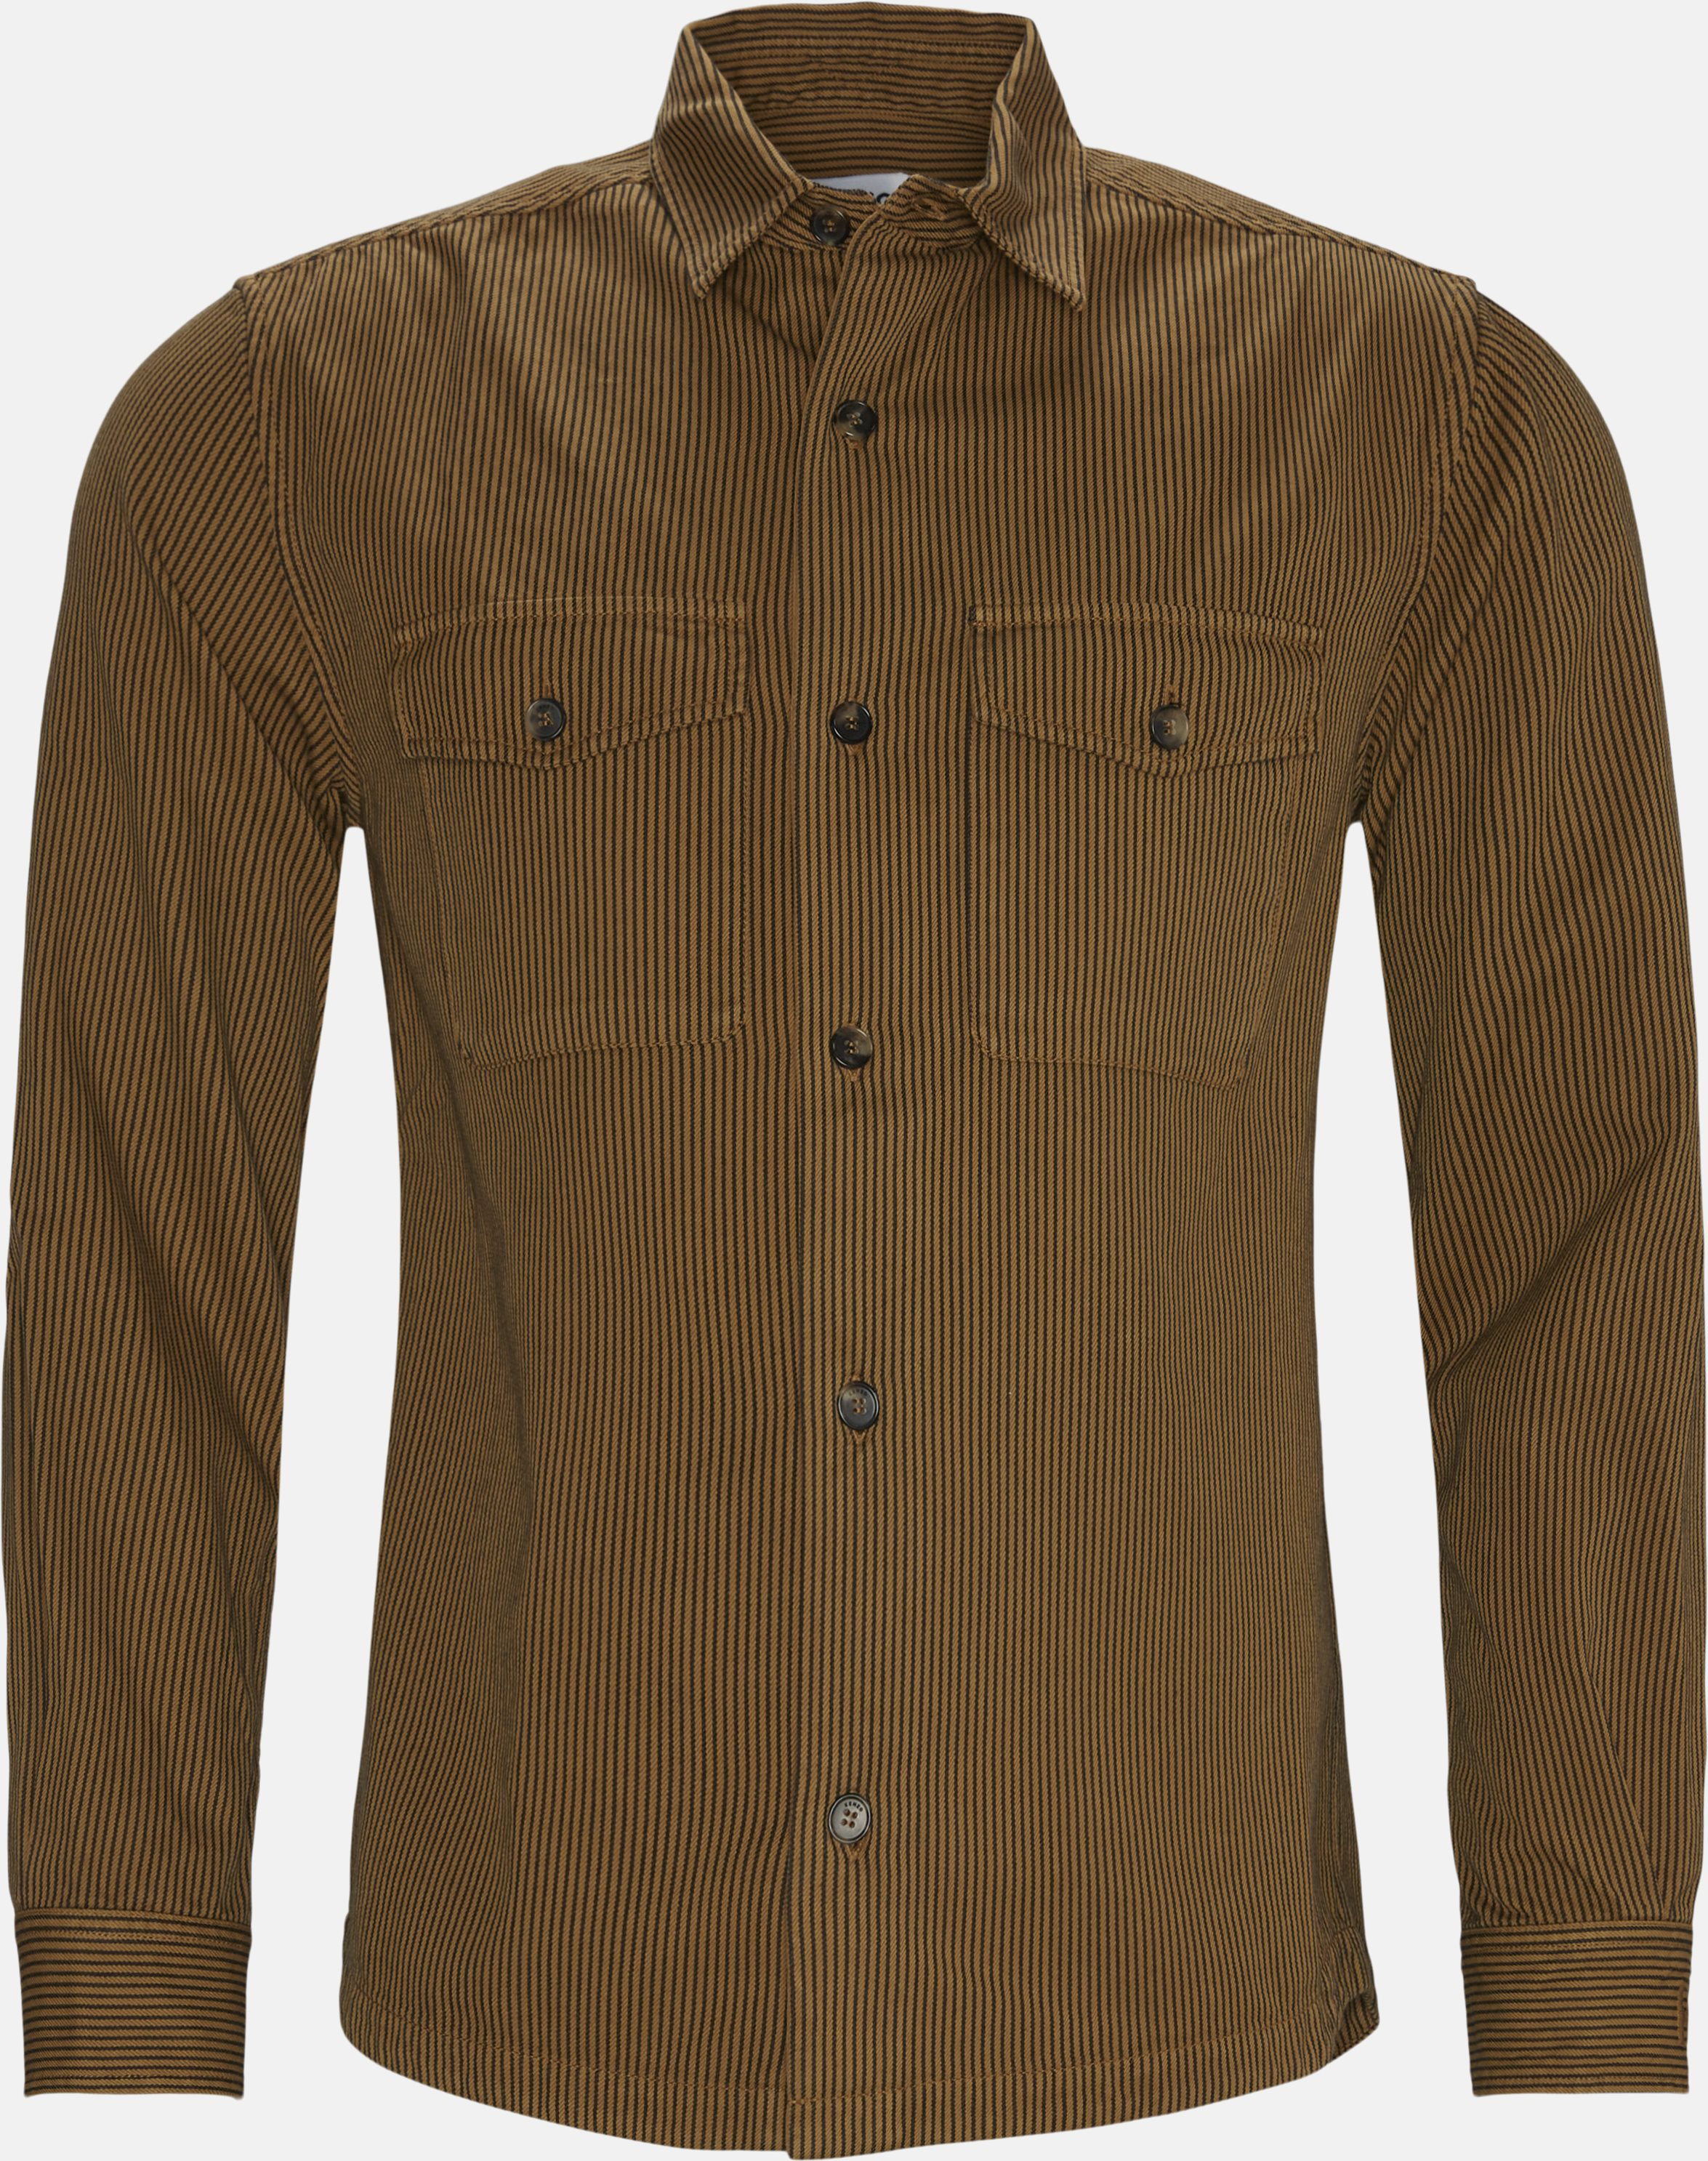 Shirts - Regular - Brown